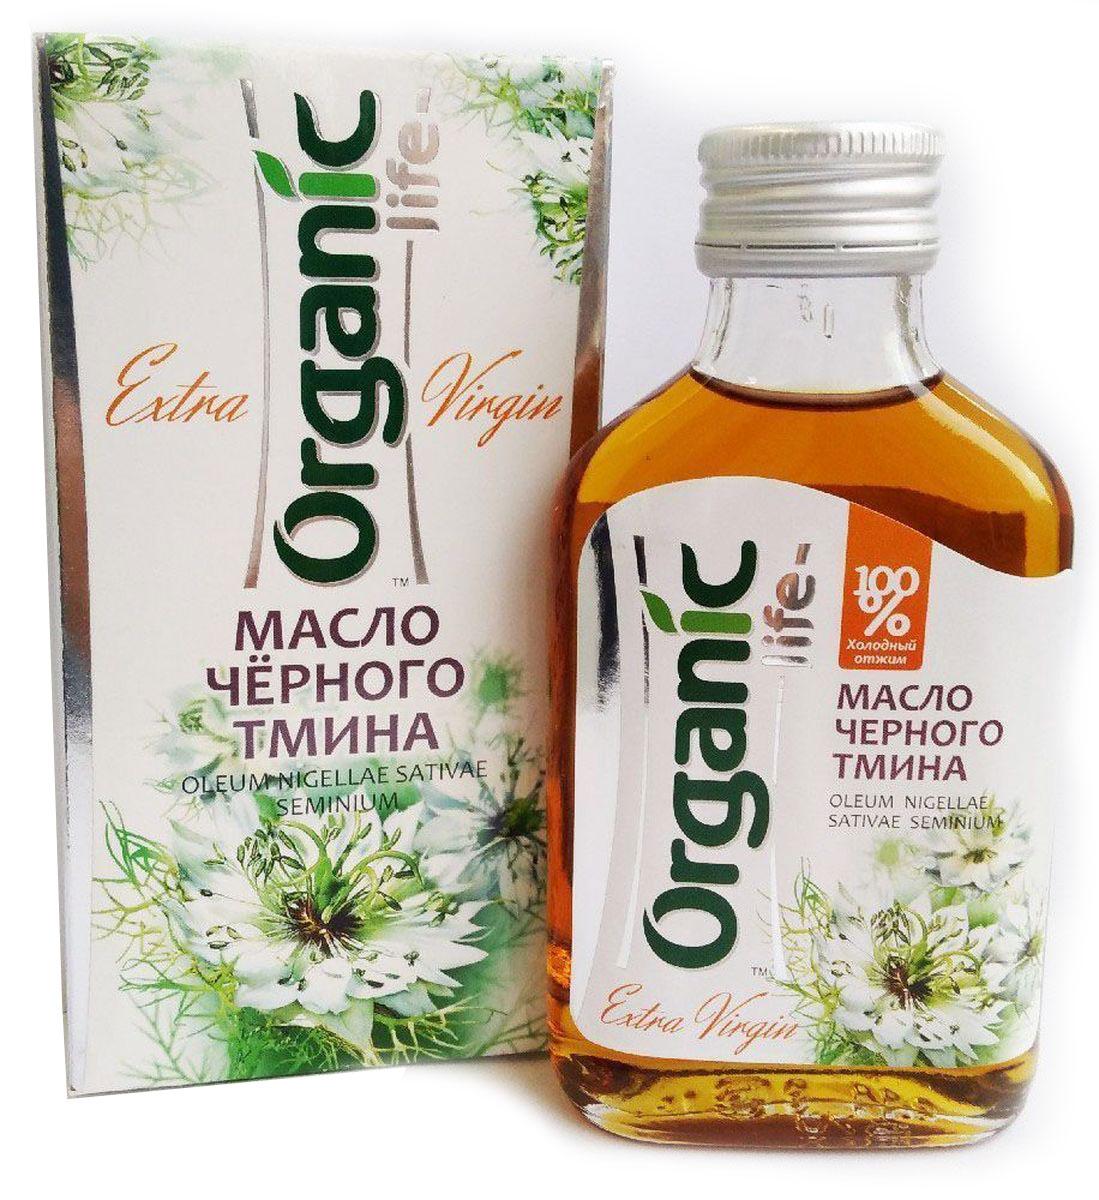 Organic Life масло черного тмина, 100 мл масла malak bio масло чёрного тмина